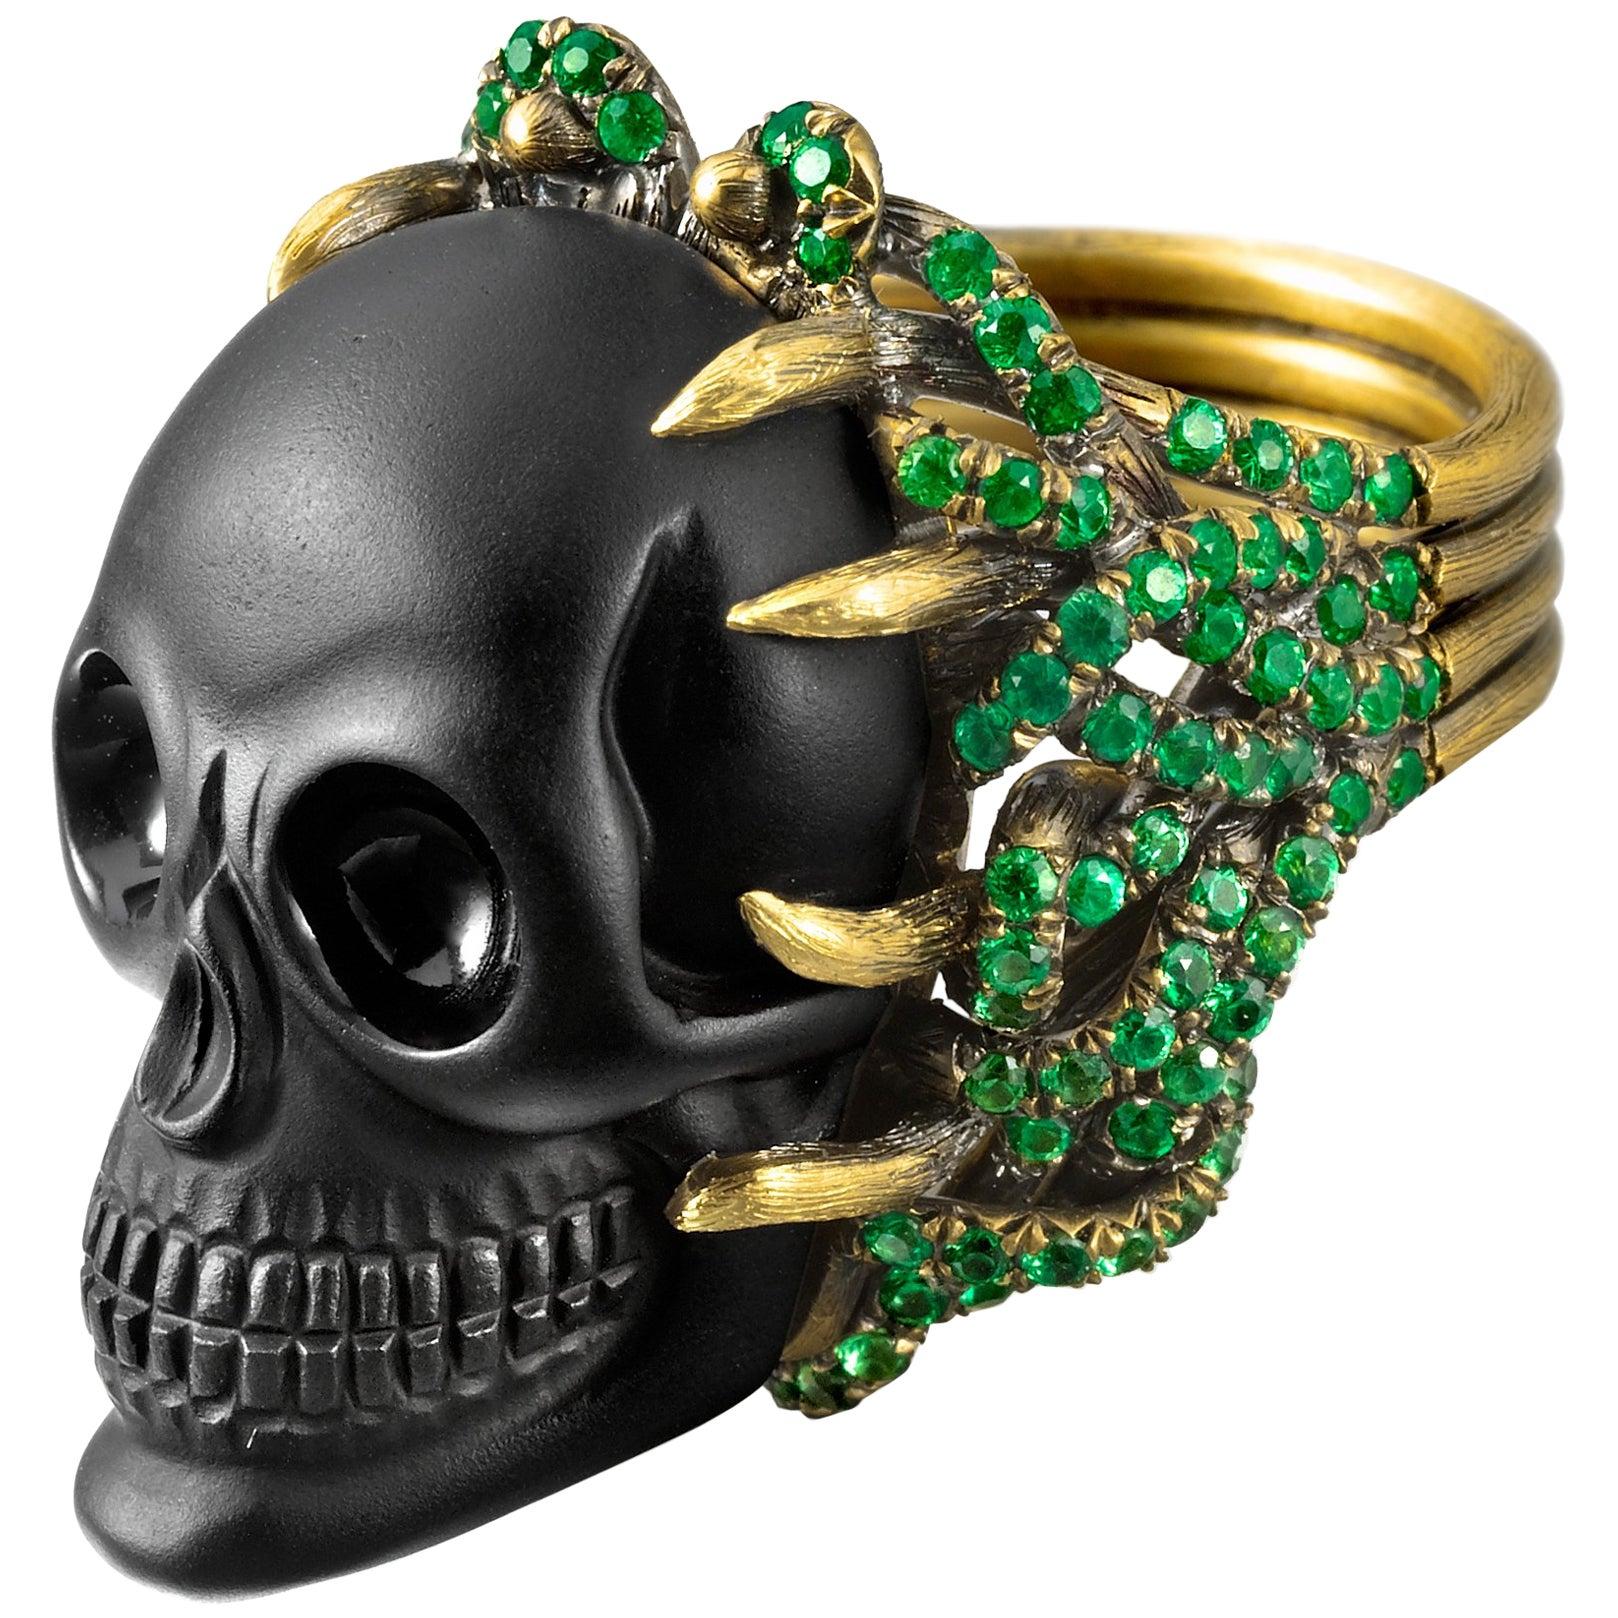 Wendy Brandes Onyx and Green Garnet Skull Ring